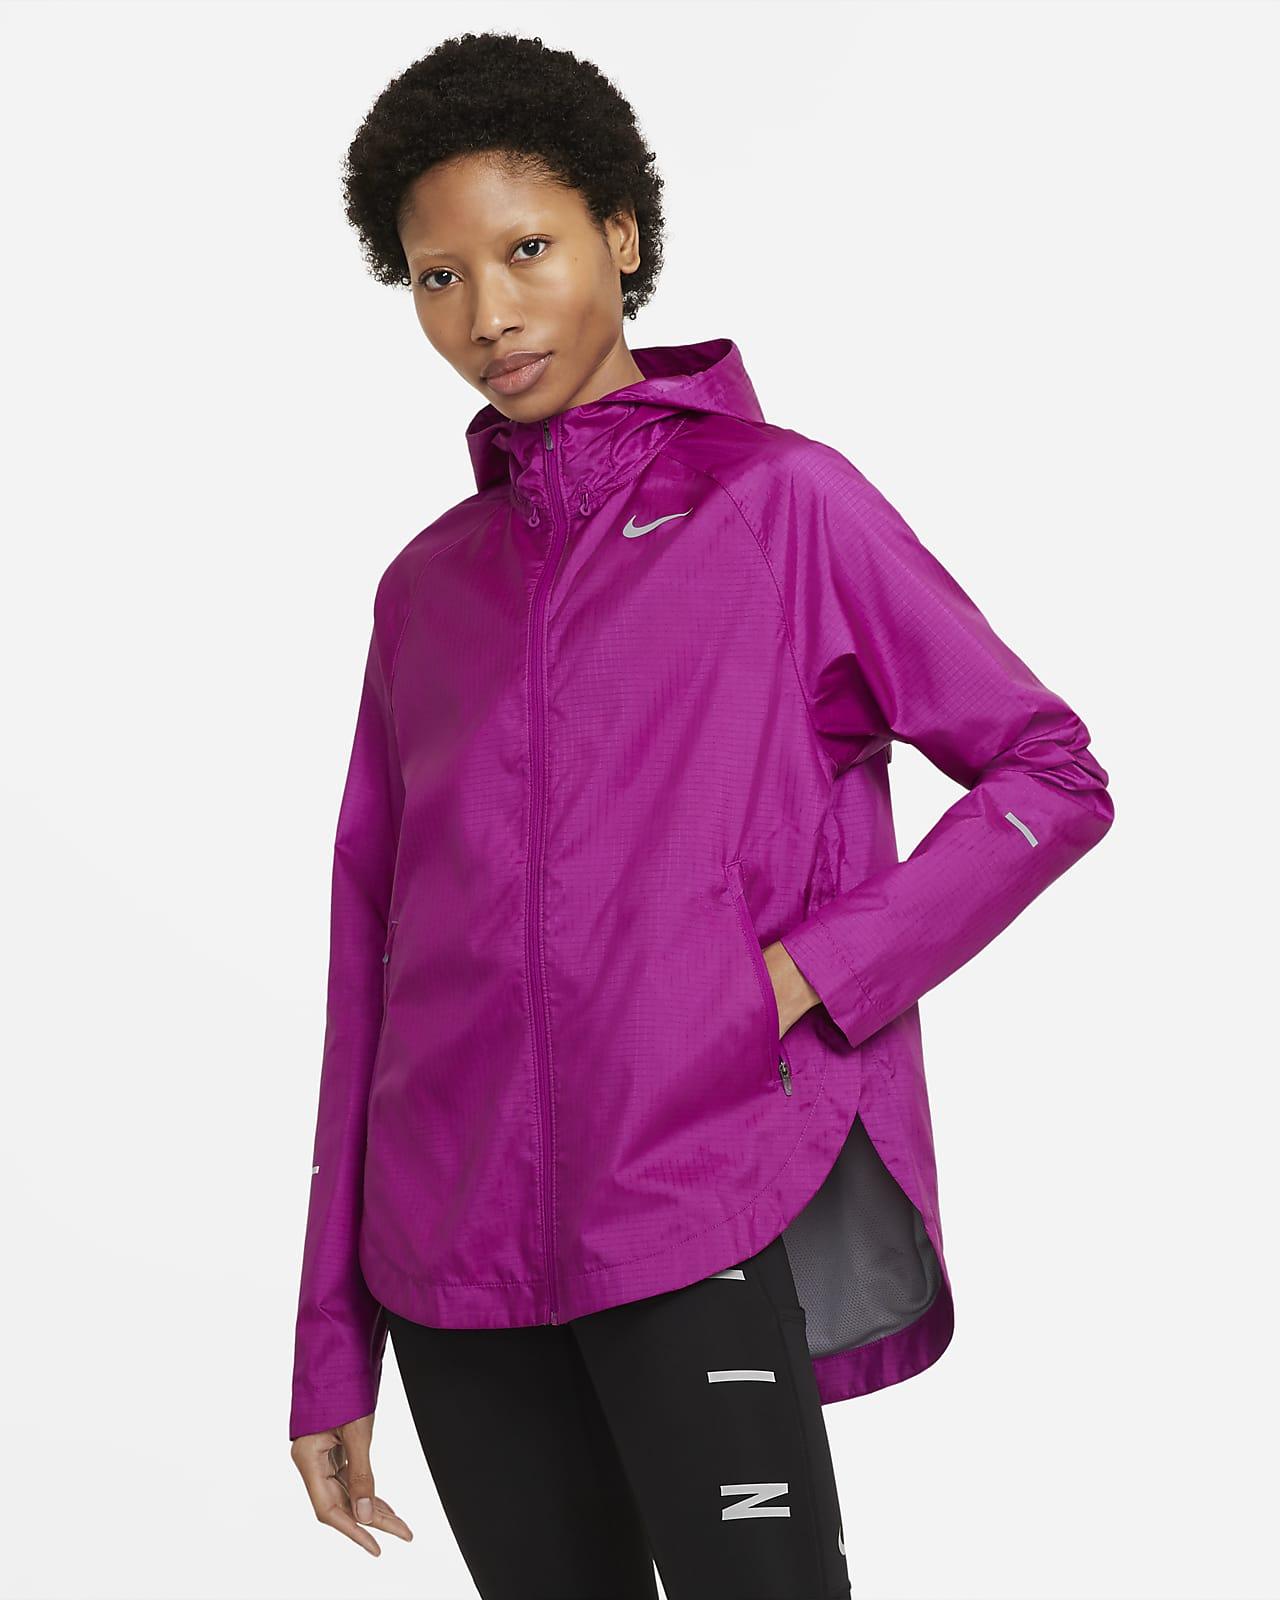 Veste de running Nike Essential Run Division pour Femme